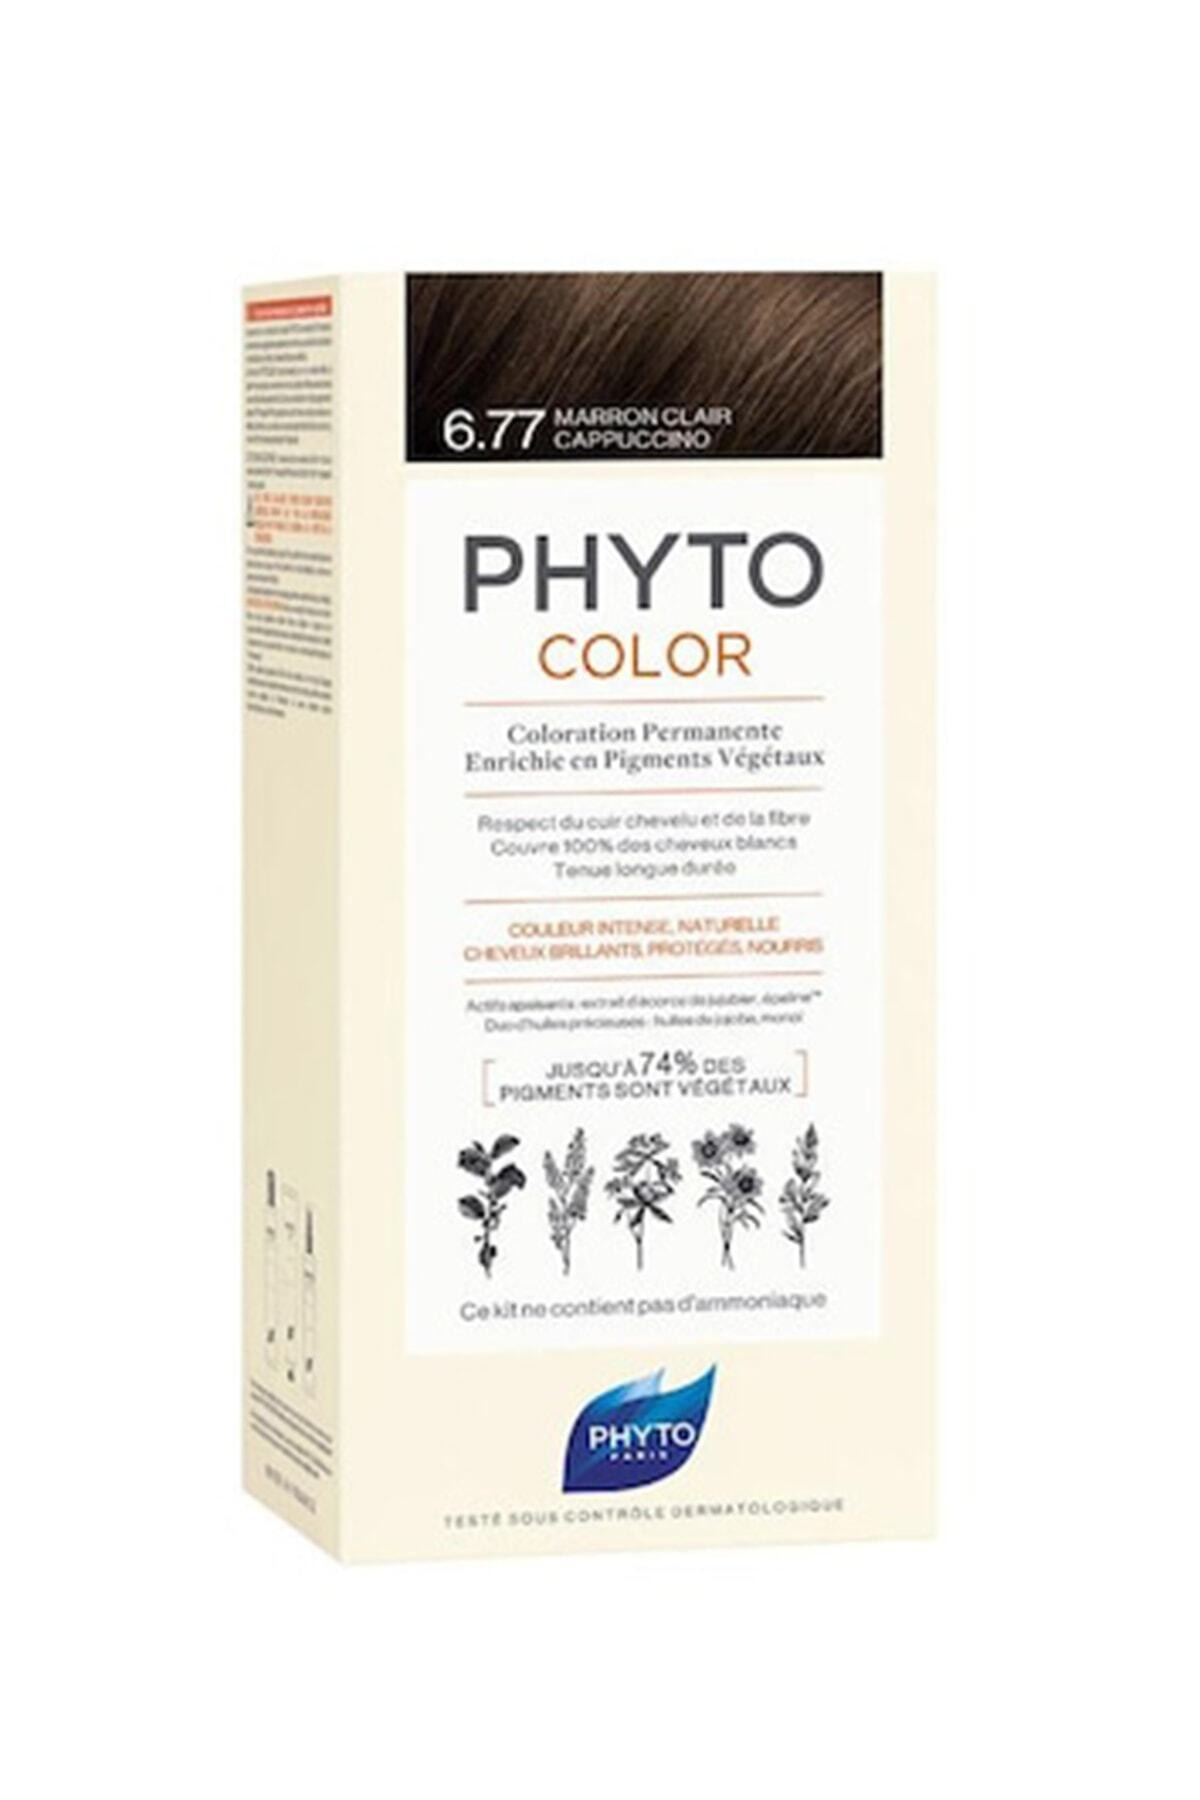 Phyto Color 6.77 - Cappuccino Kahve (Bitkisel Saç Boyası) - 1